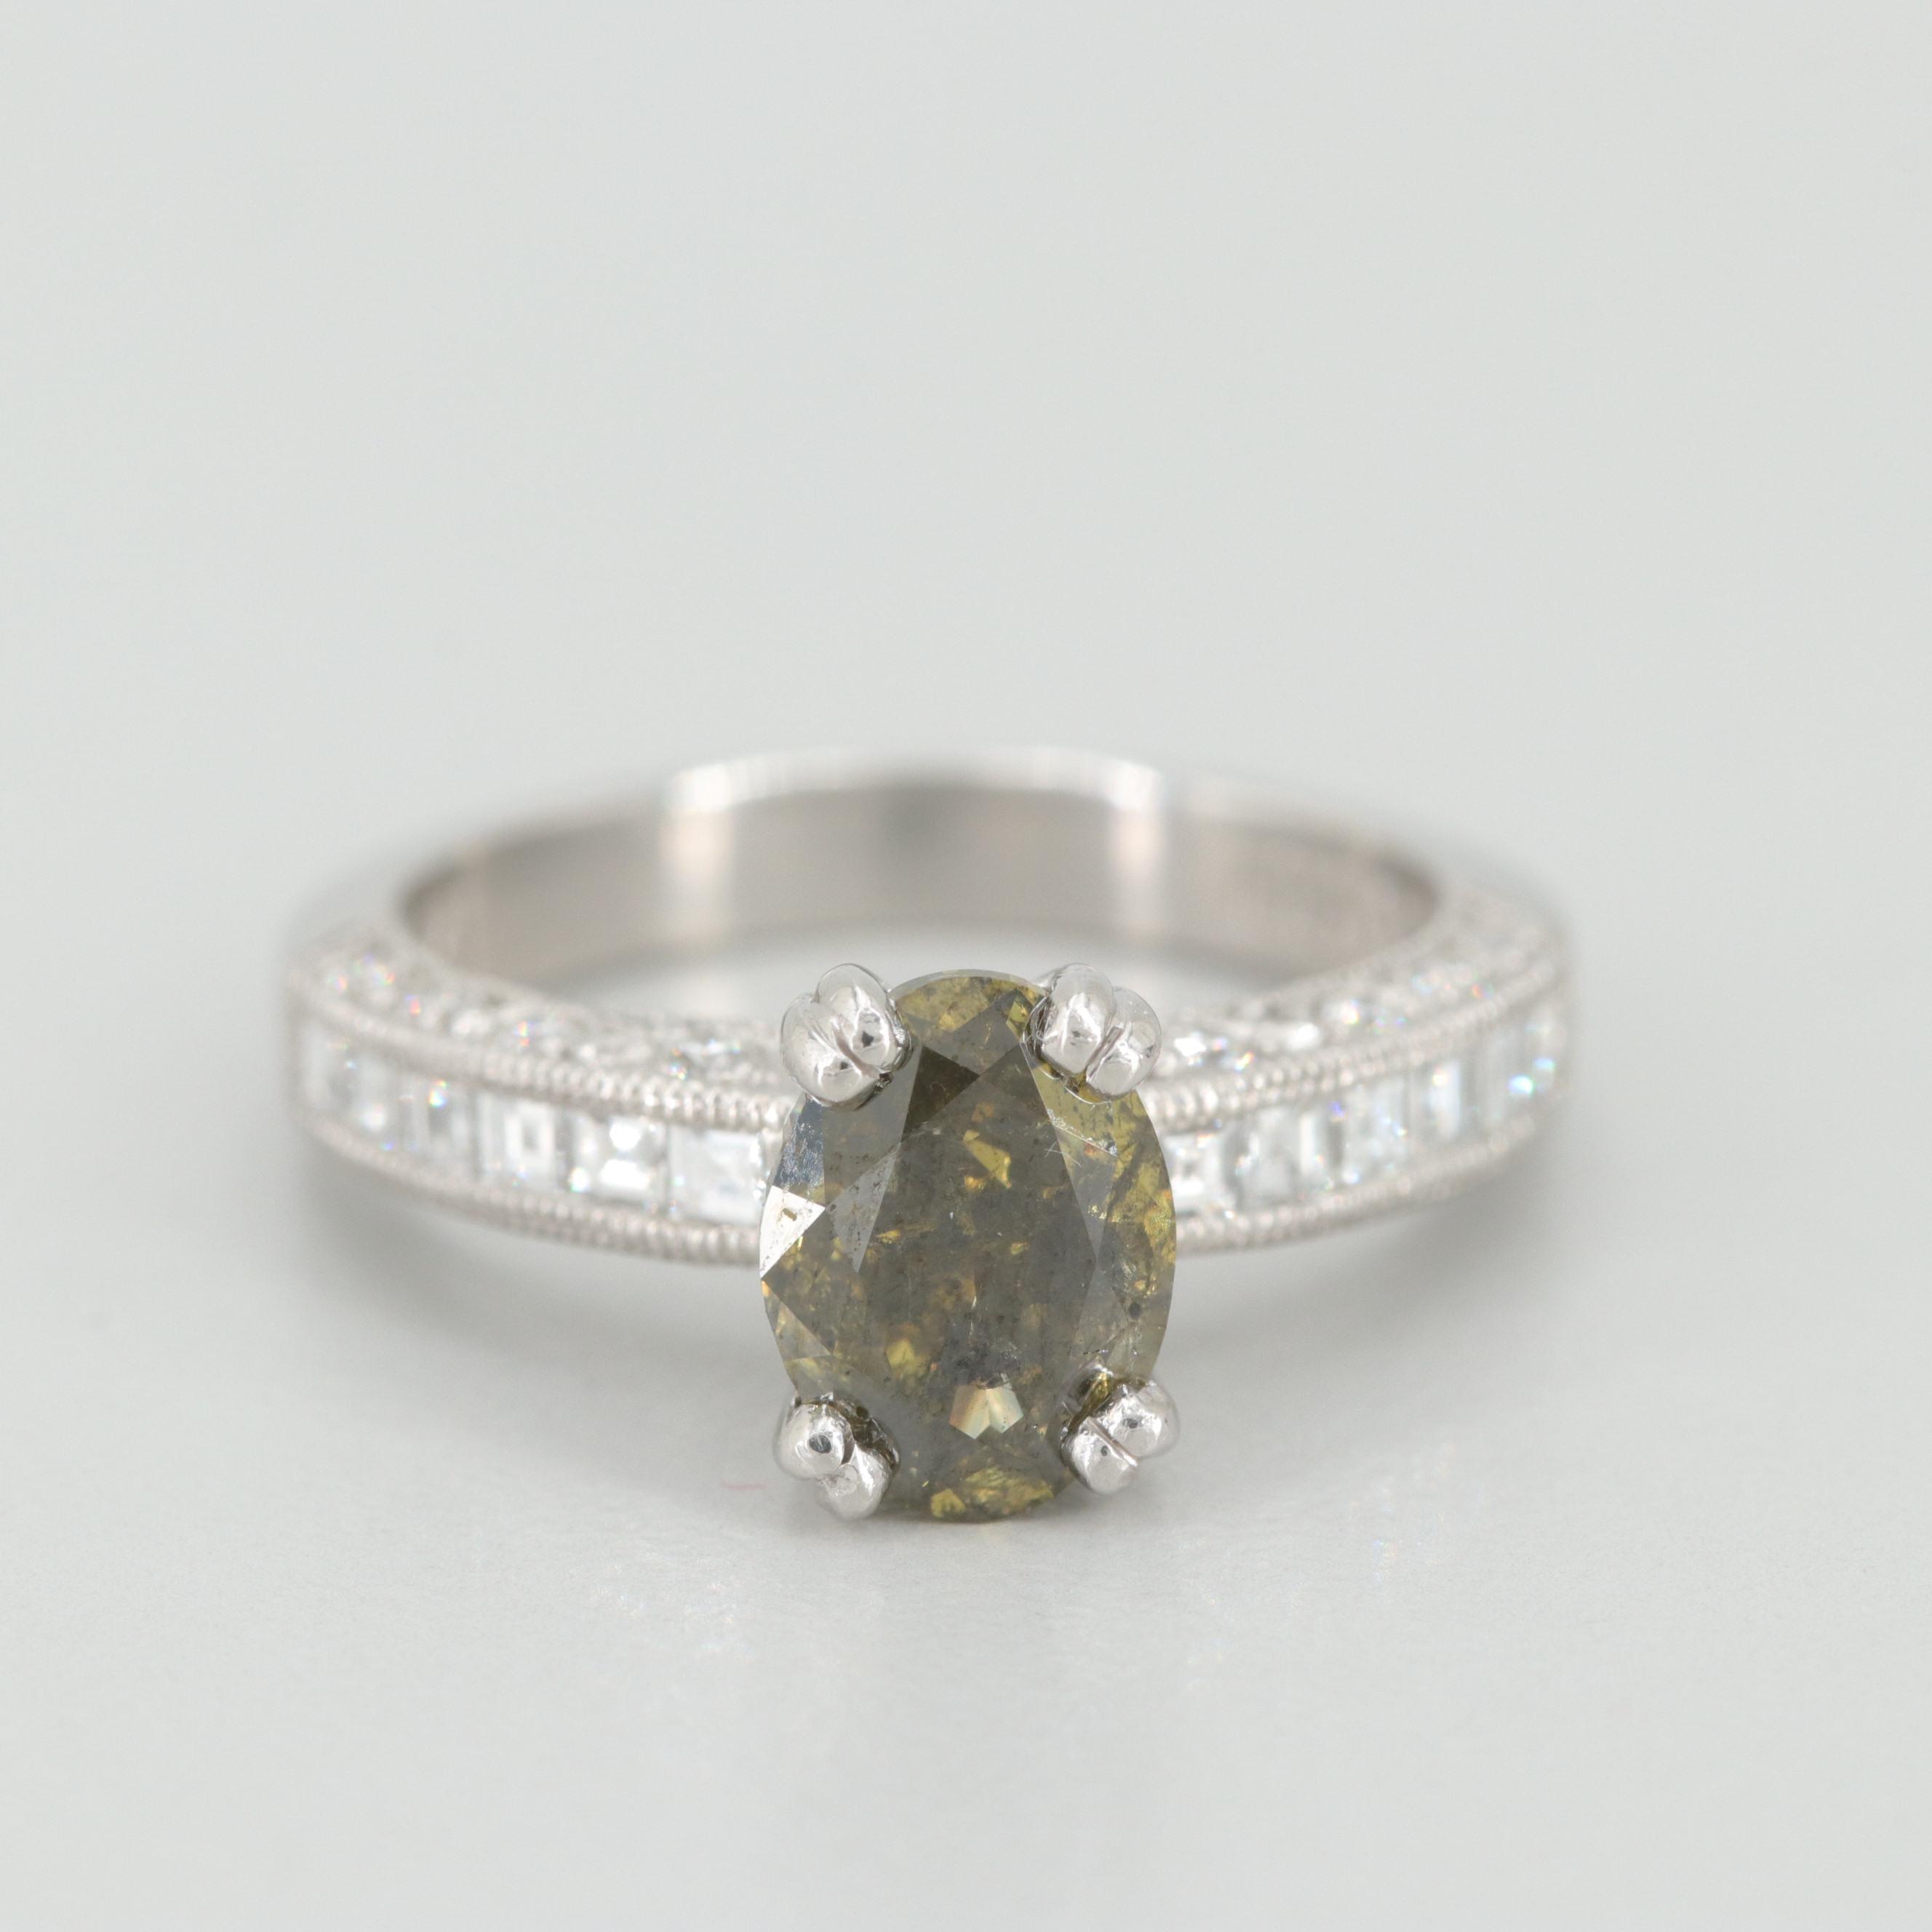 Tacori Platinum 2.39 CTW Fancy DGY Green Diamond Ring with GIA Report